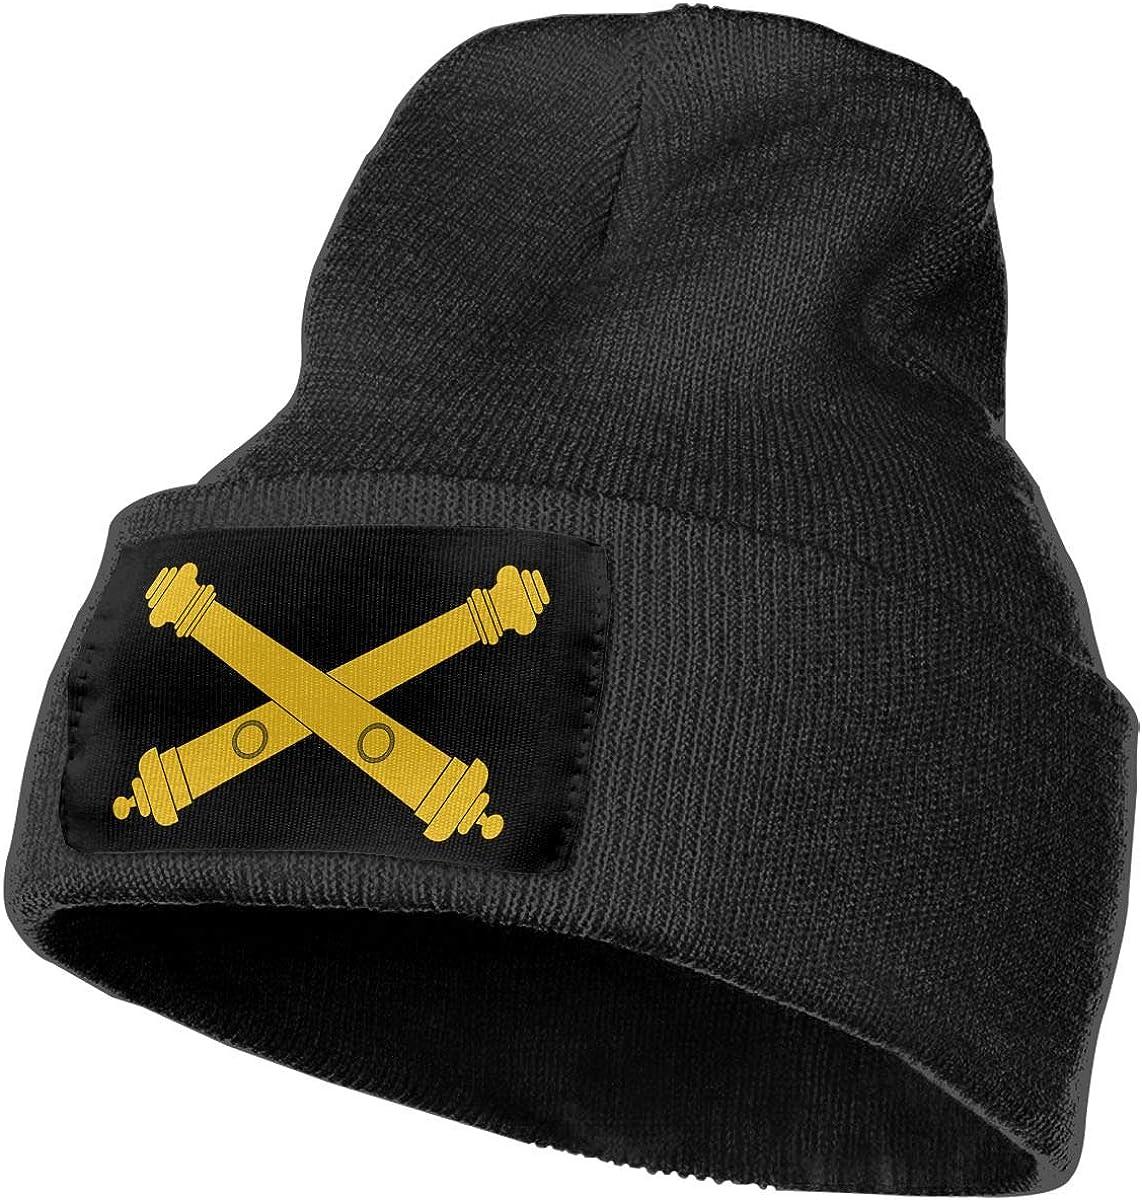 Mens/&Womens Army Field Artillery Logo Beanie Cap Thick,Soft,Warm Slouchy Knit Hat Winter Soft Ski Cap